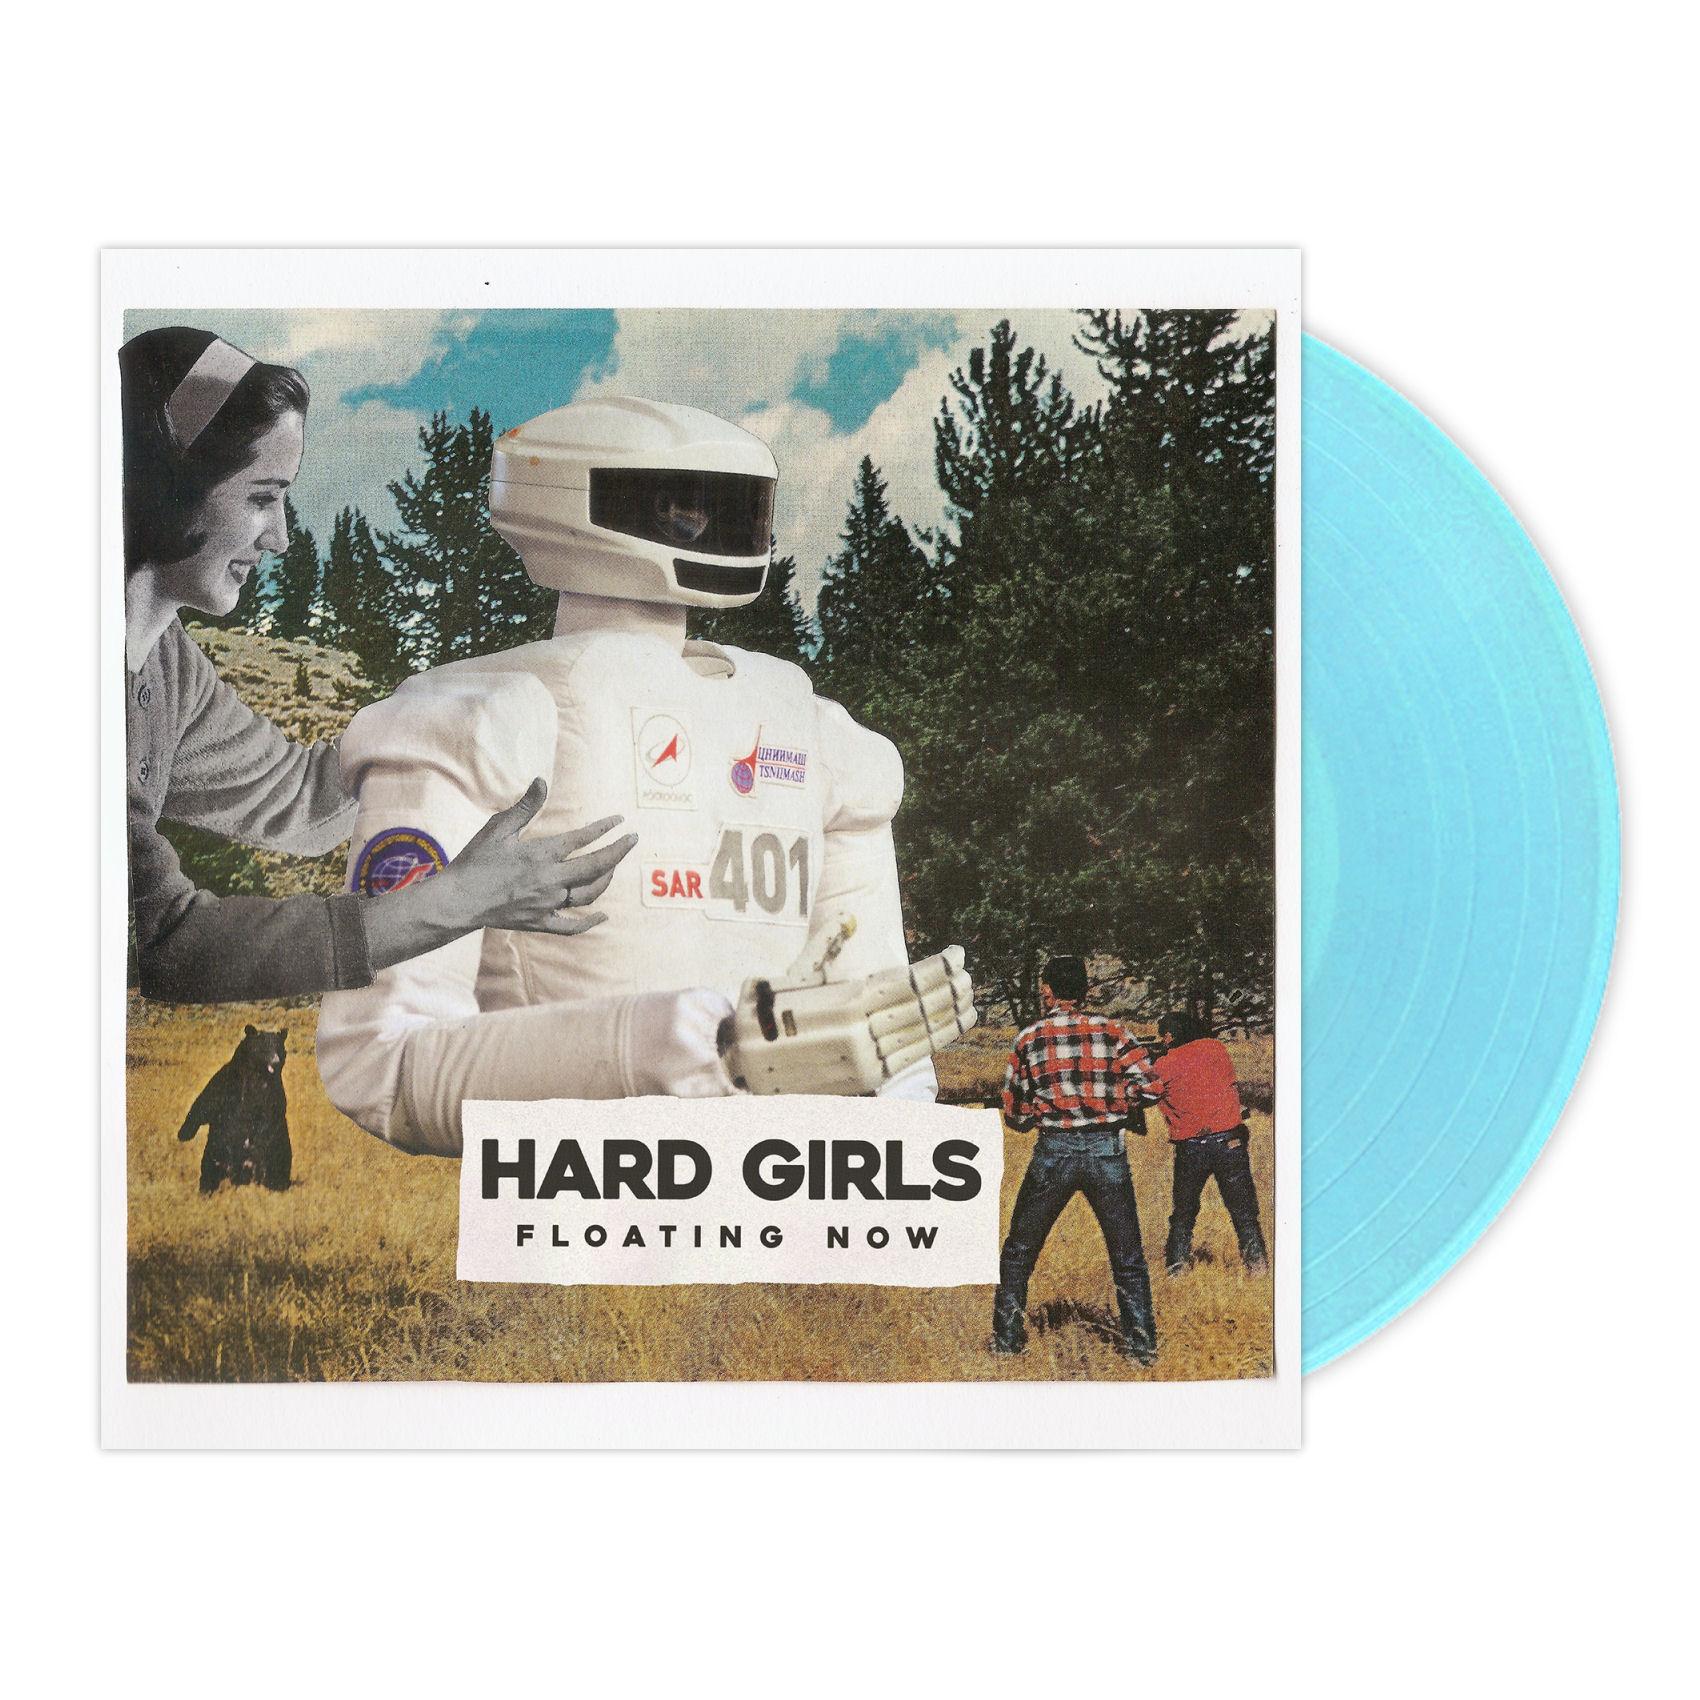 Hard Girls - Floating Now LP / CD